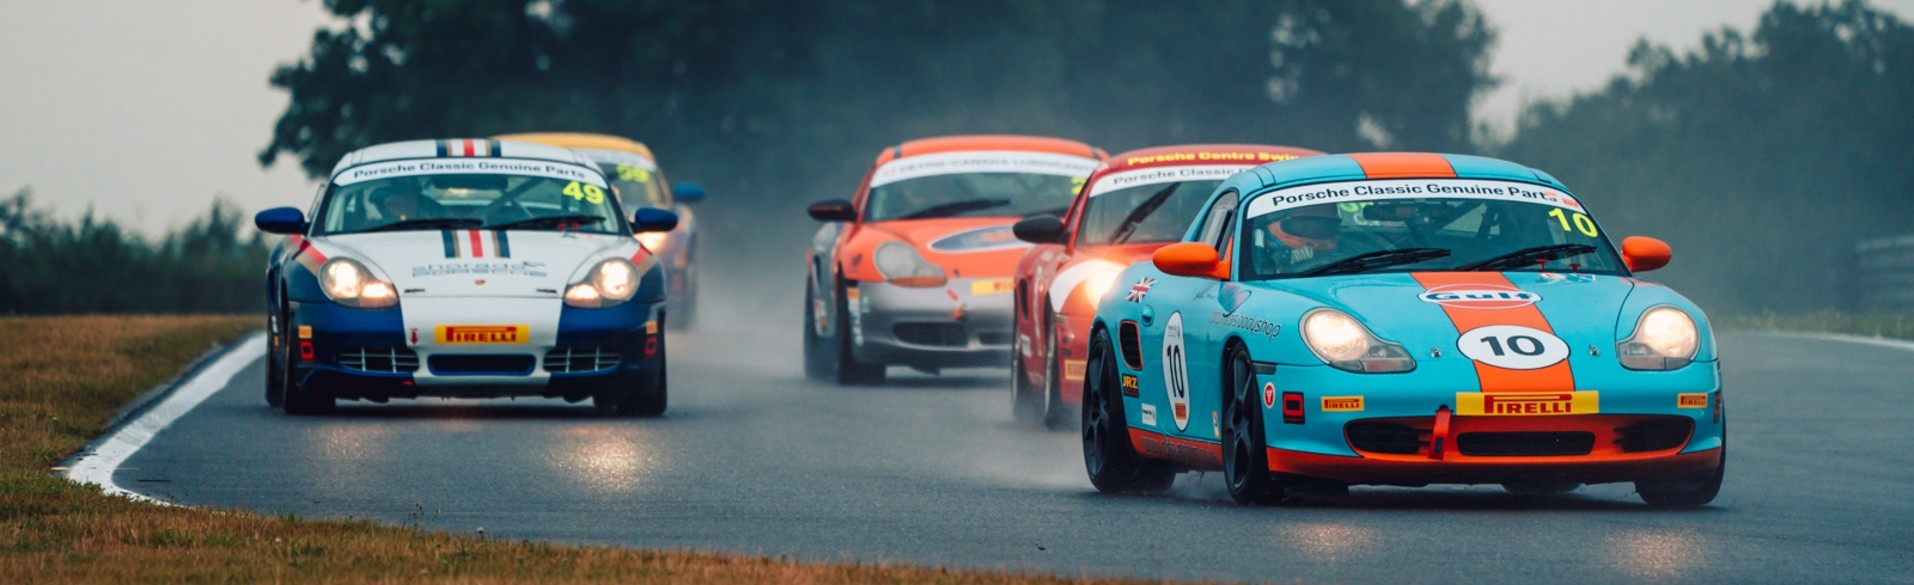 Porsche Centres Compete At Snetterton Circuit